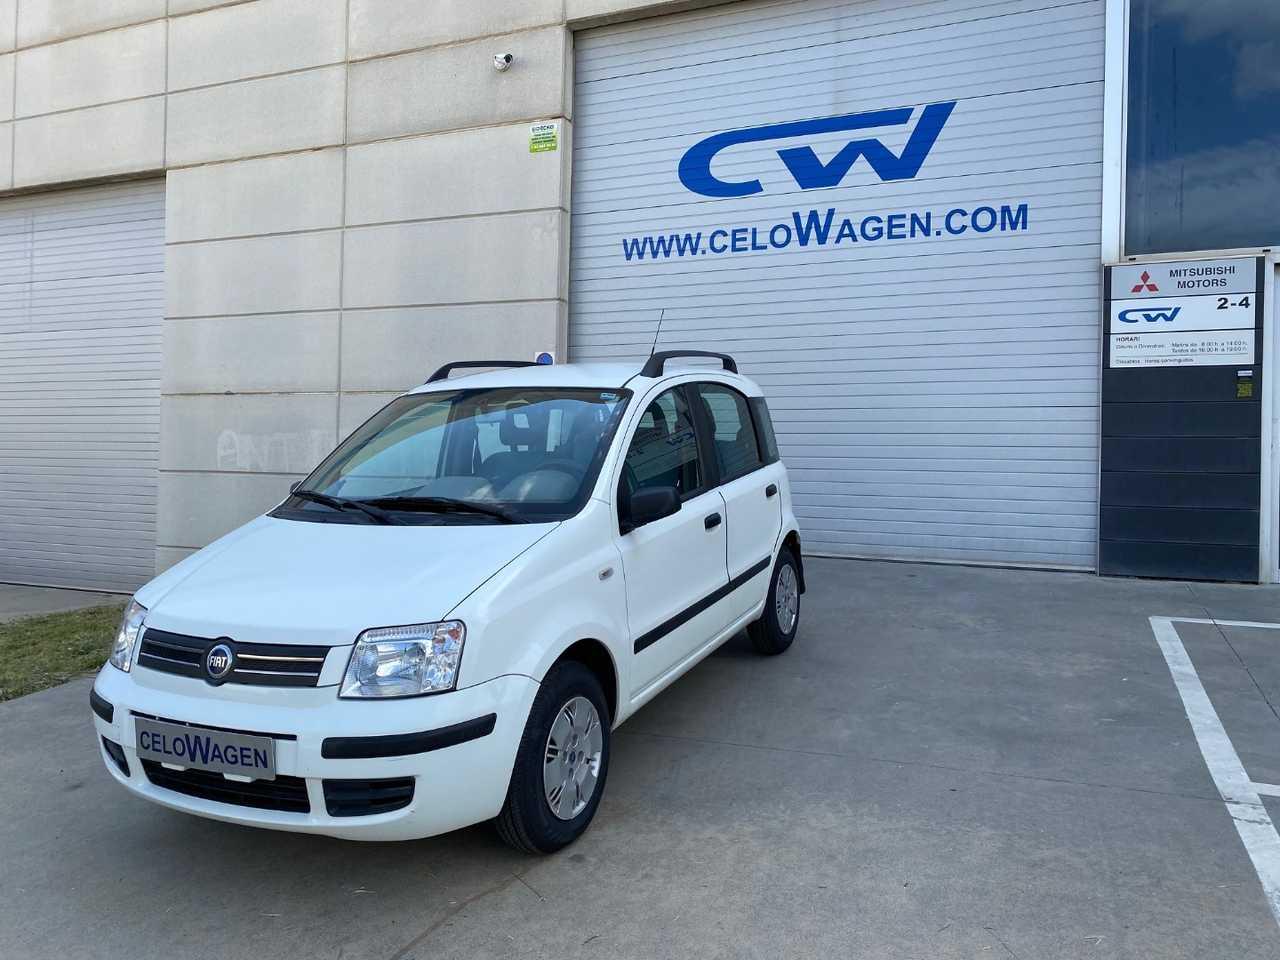 Fiat Panda 1.3 16v Multijet Dynamic   - Foto 1